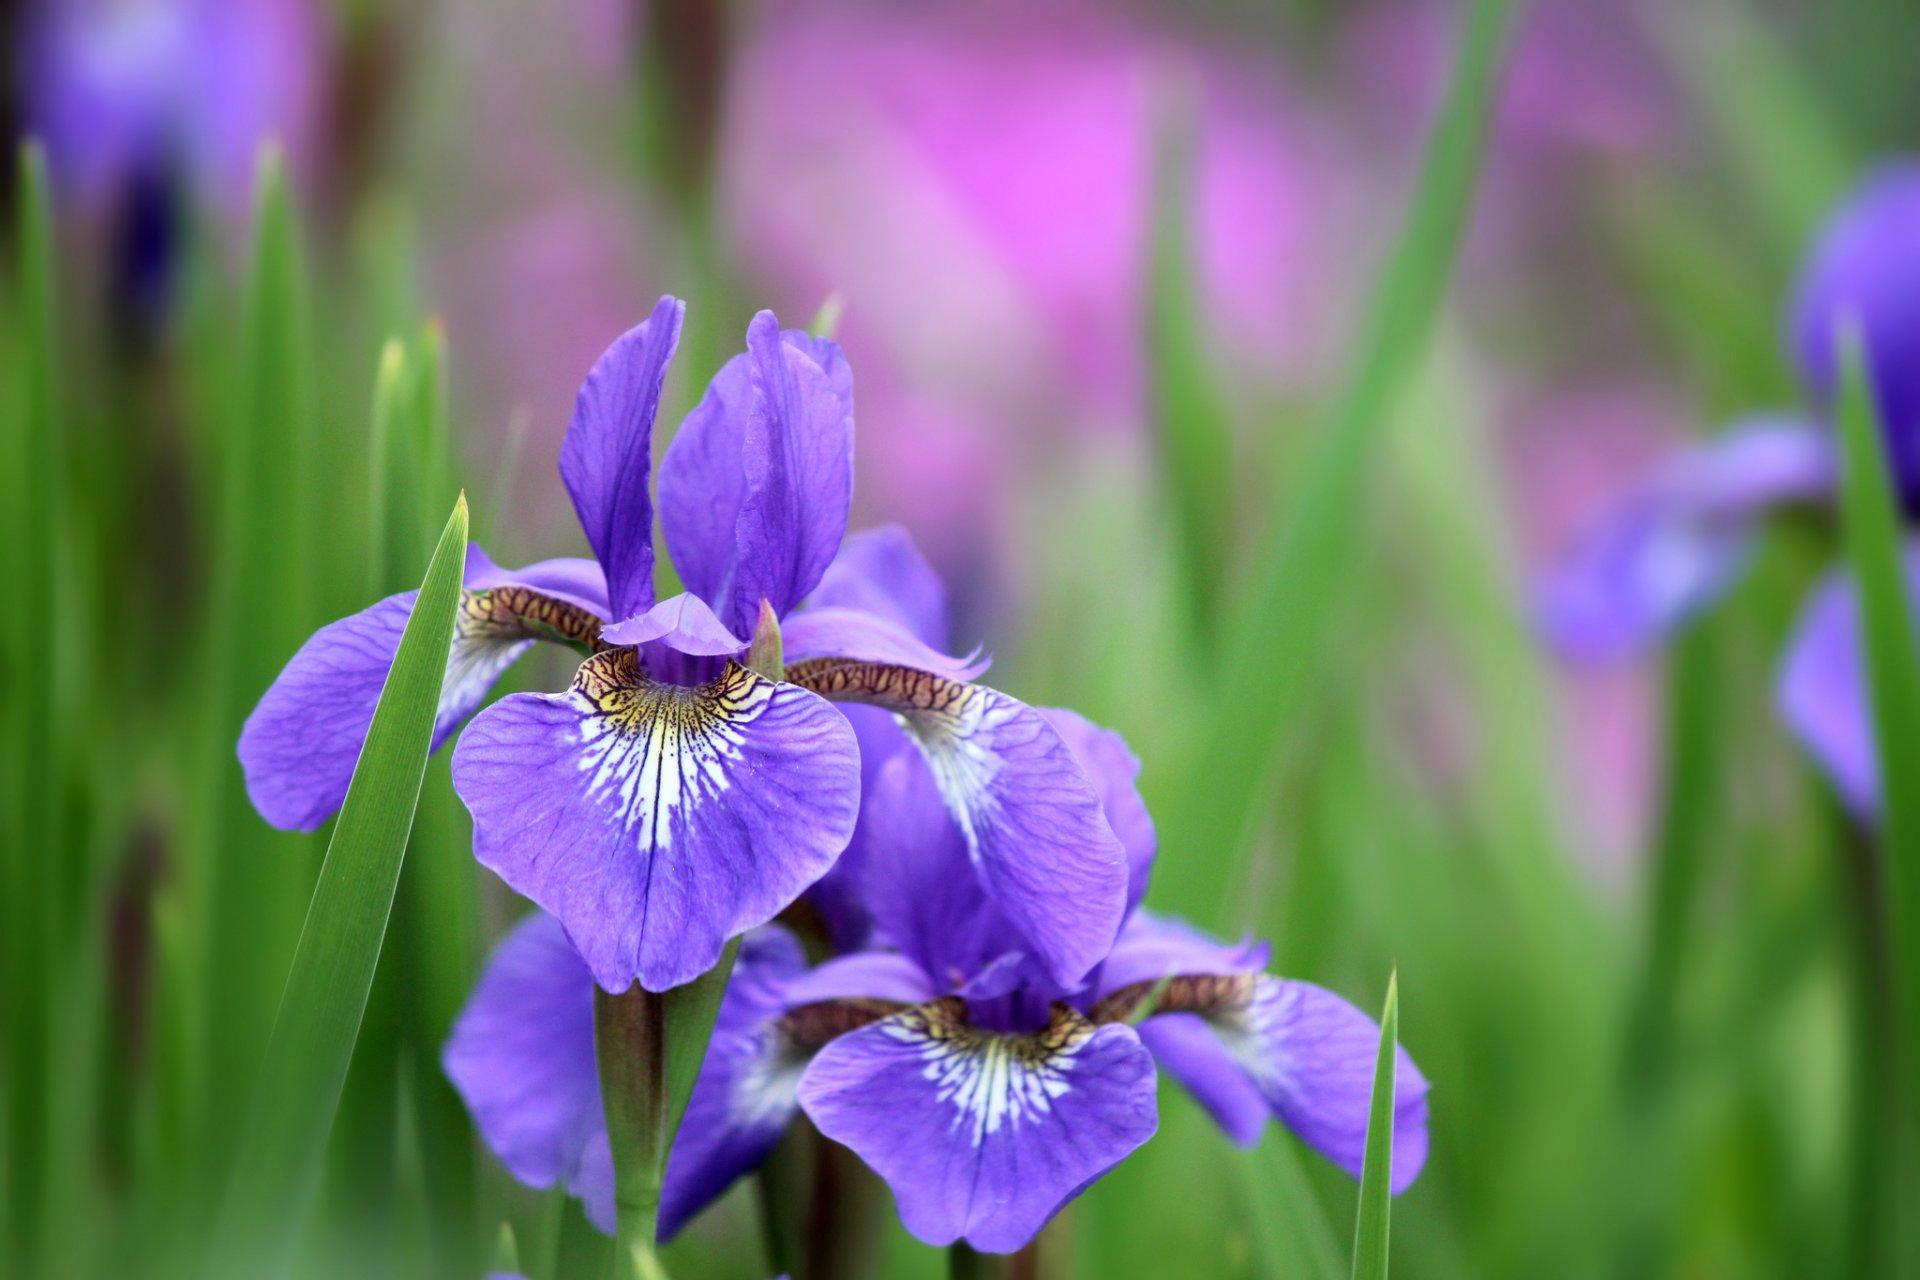 Hilary Duff Nude Photos Videos - Celeb Jihad Pictures of purple irises